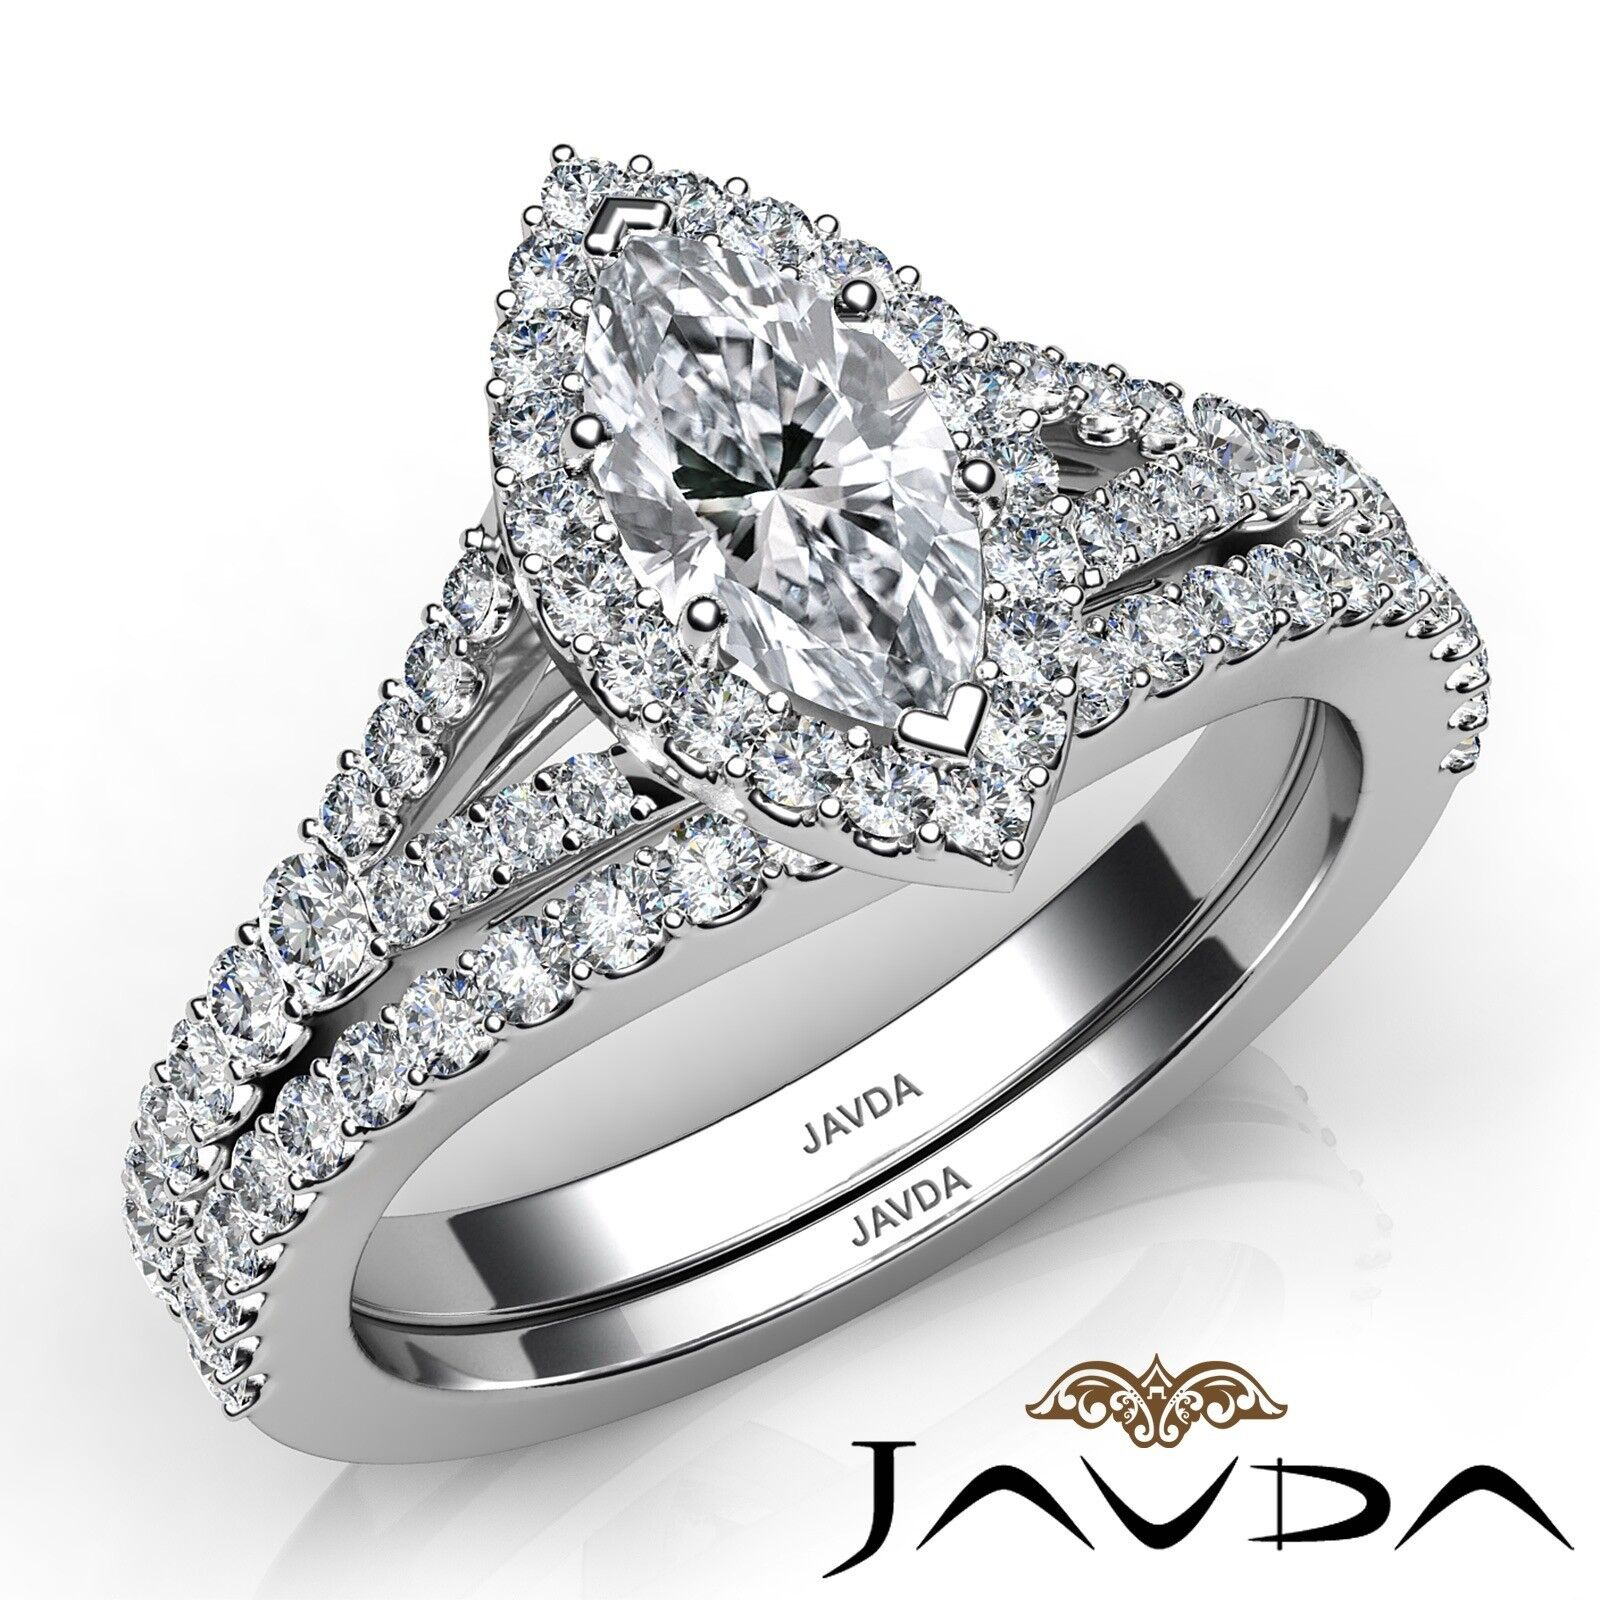 2.02ctw Halo Bridal Set Split Shank Marquise Diamond Engagement Ring GIA F-SI1 1